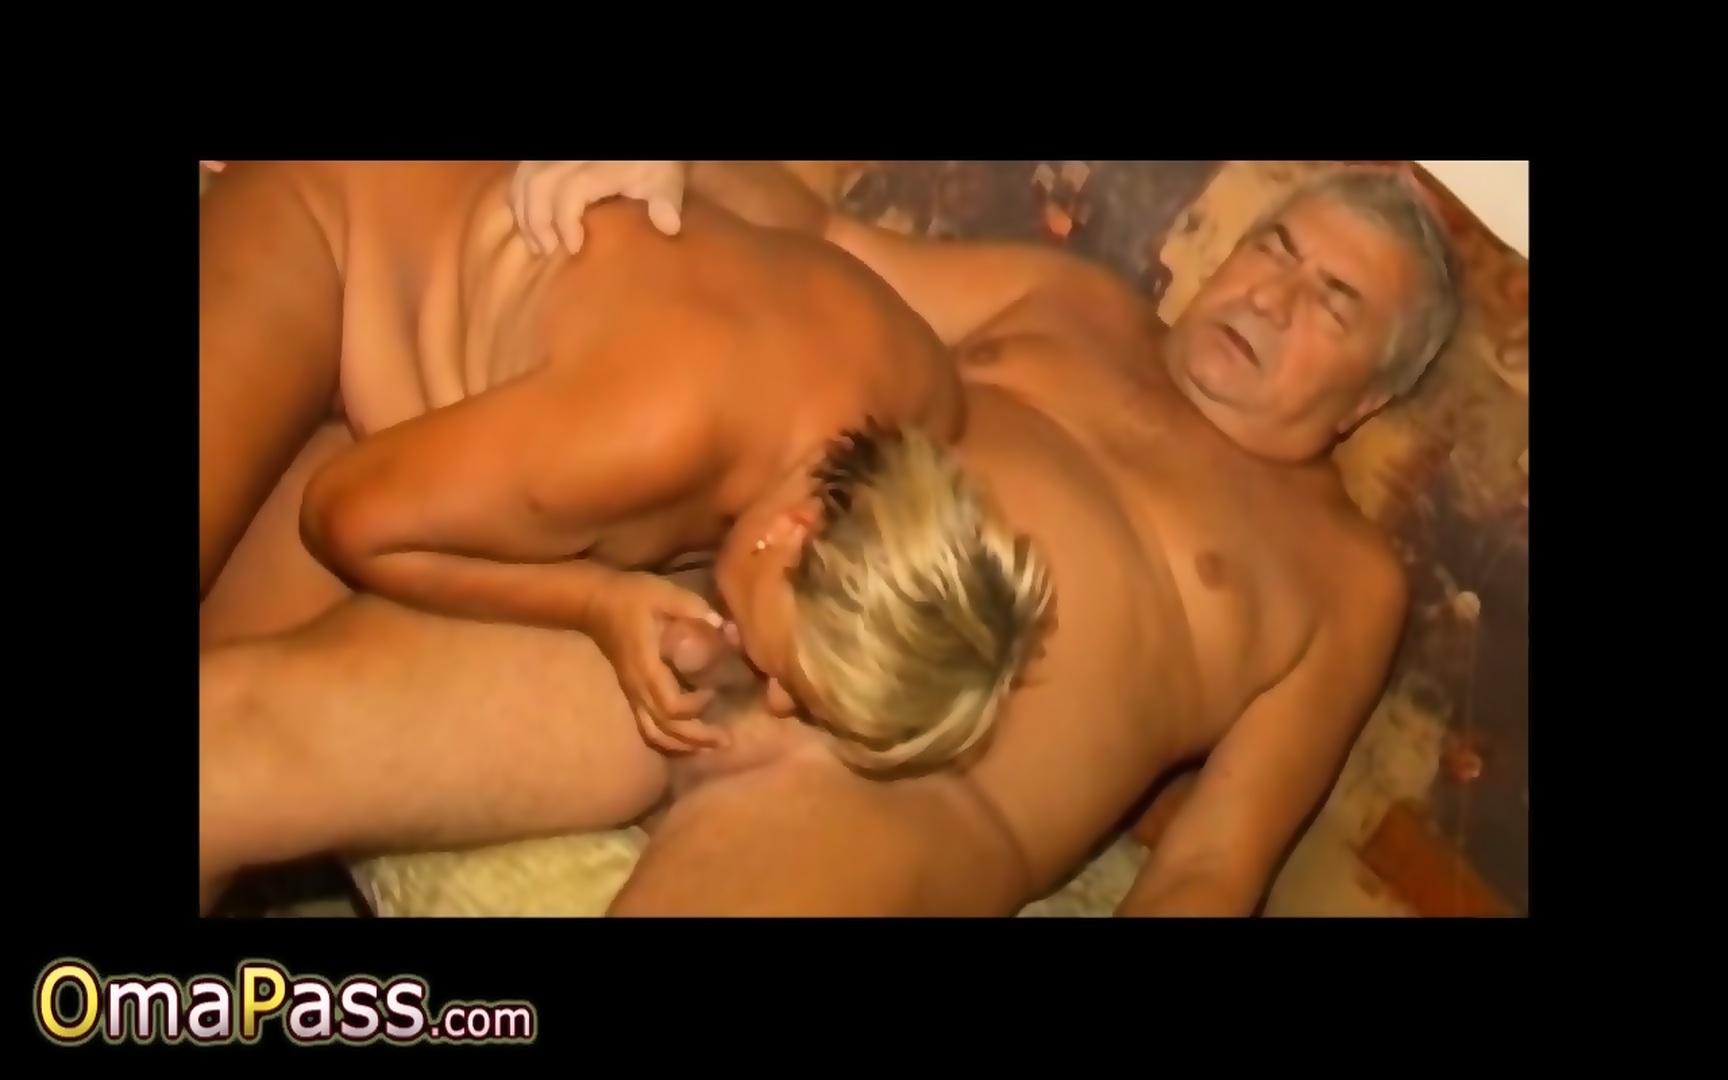 porno video hairy women